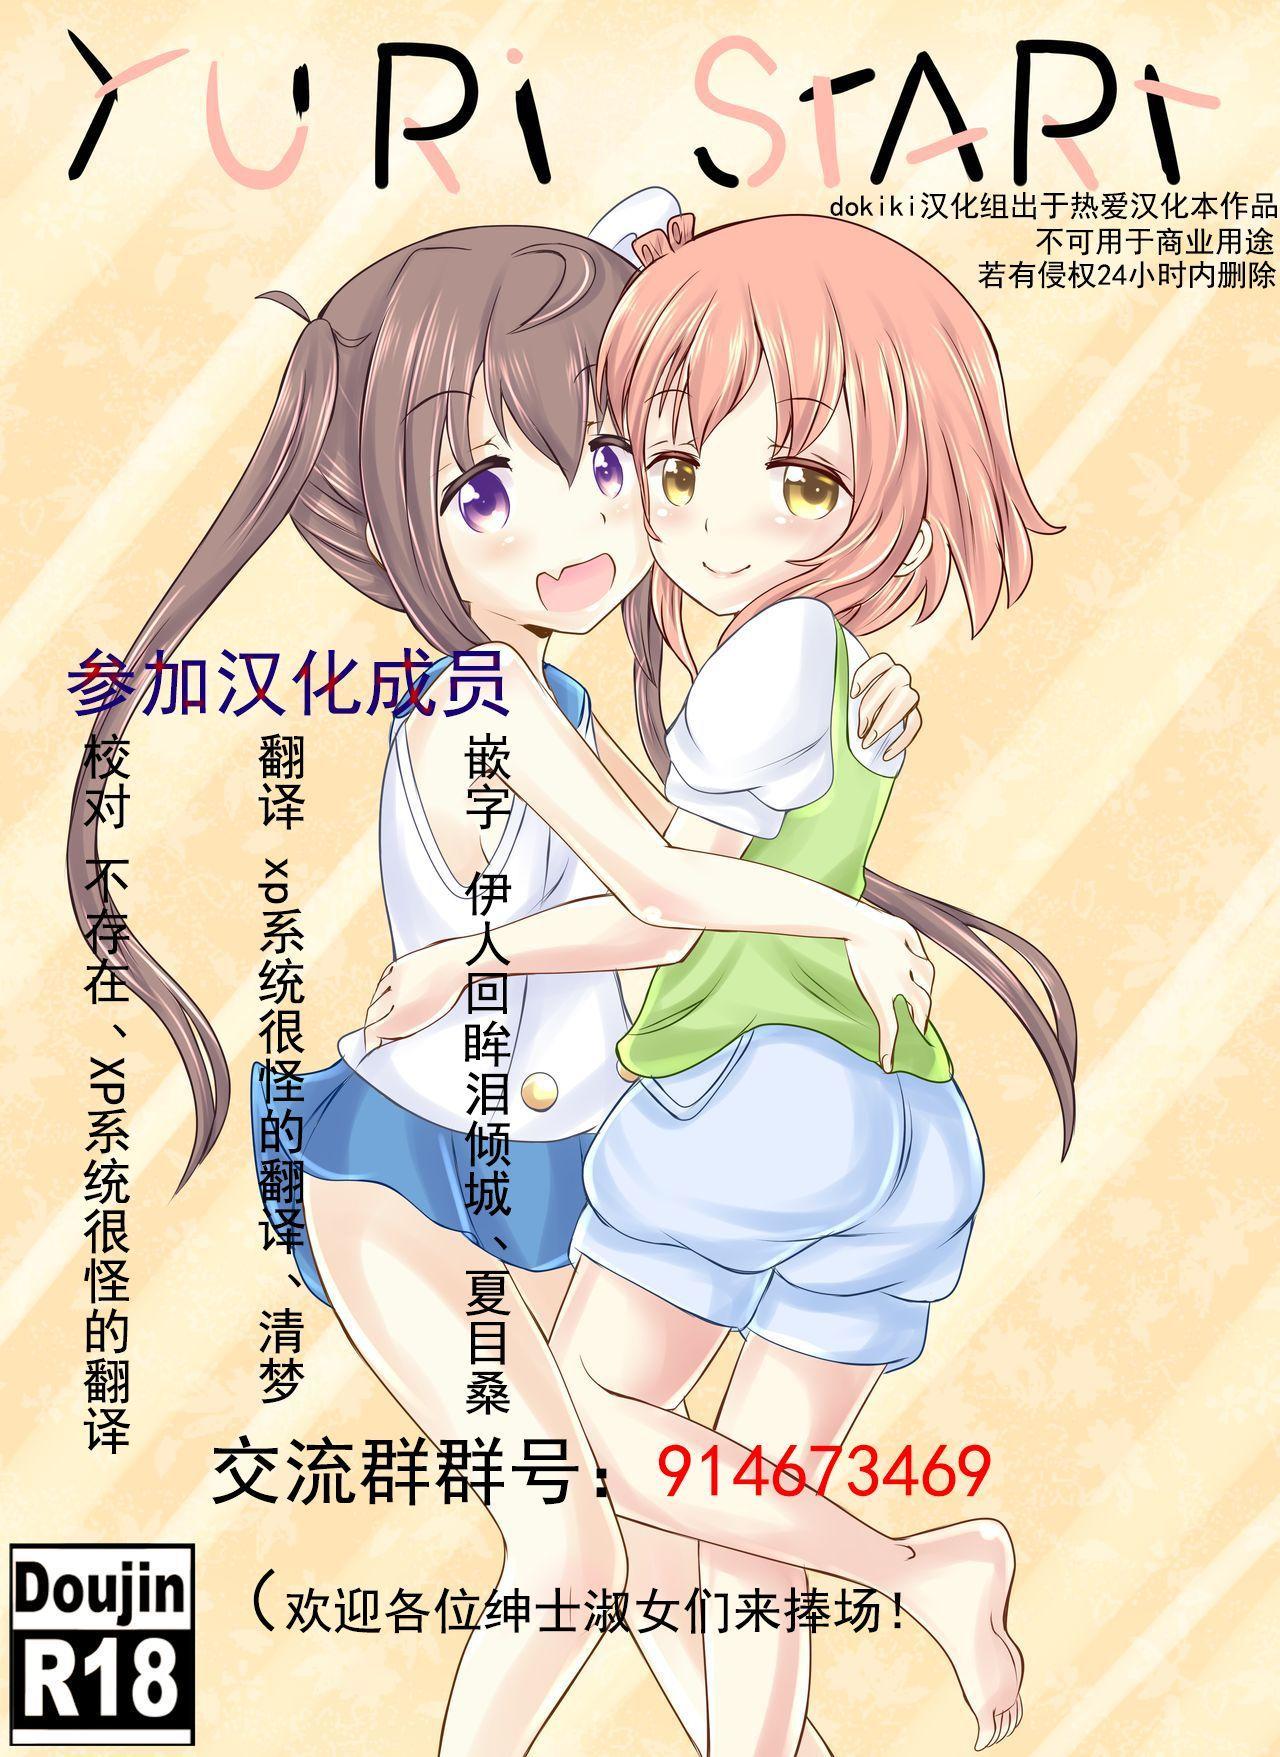 Yuri Start 0